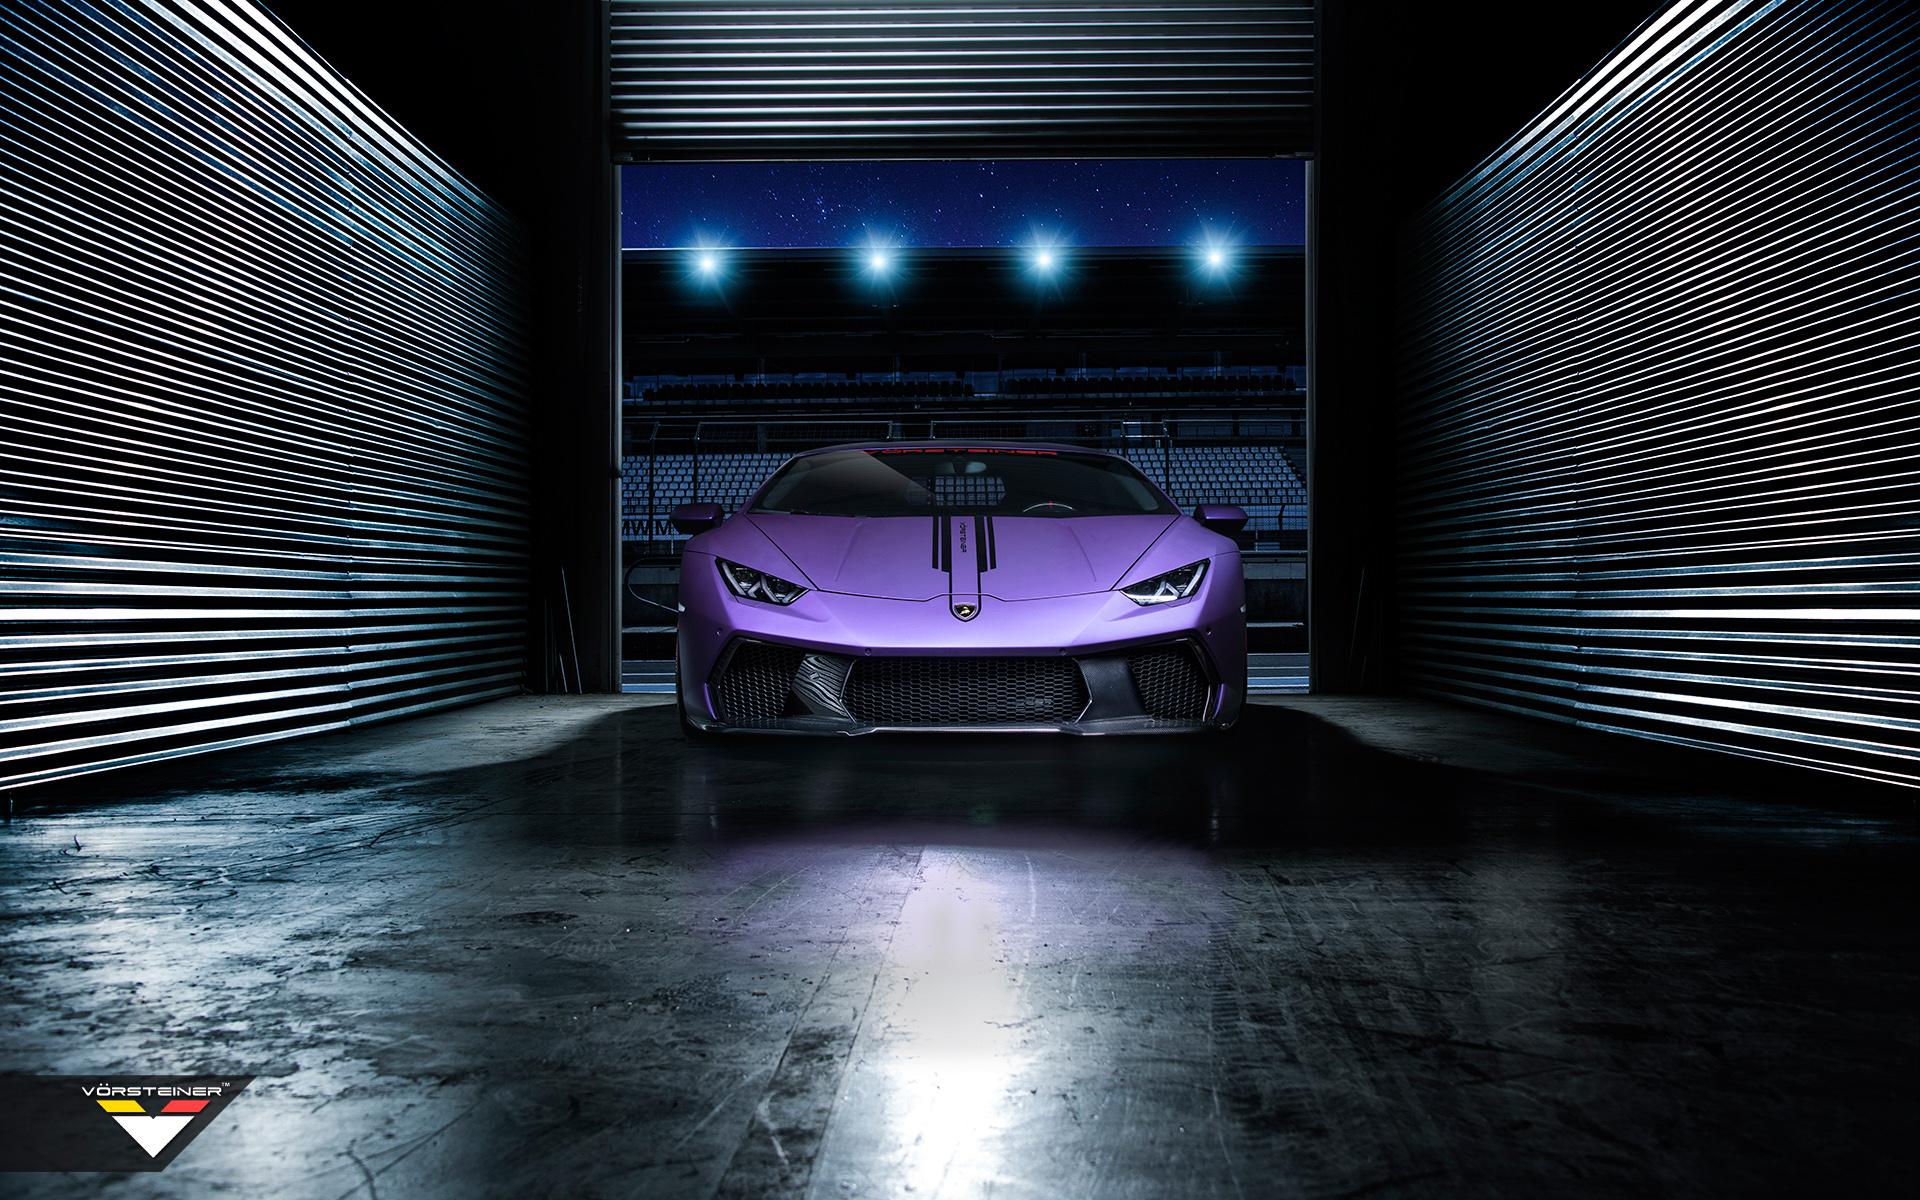 Самому классному, крутые картинки гараж